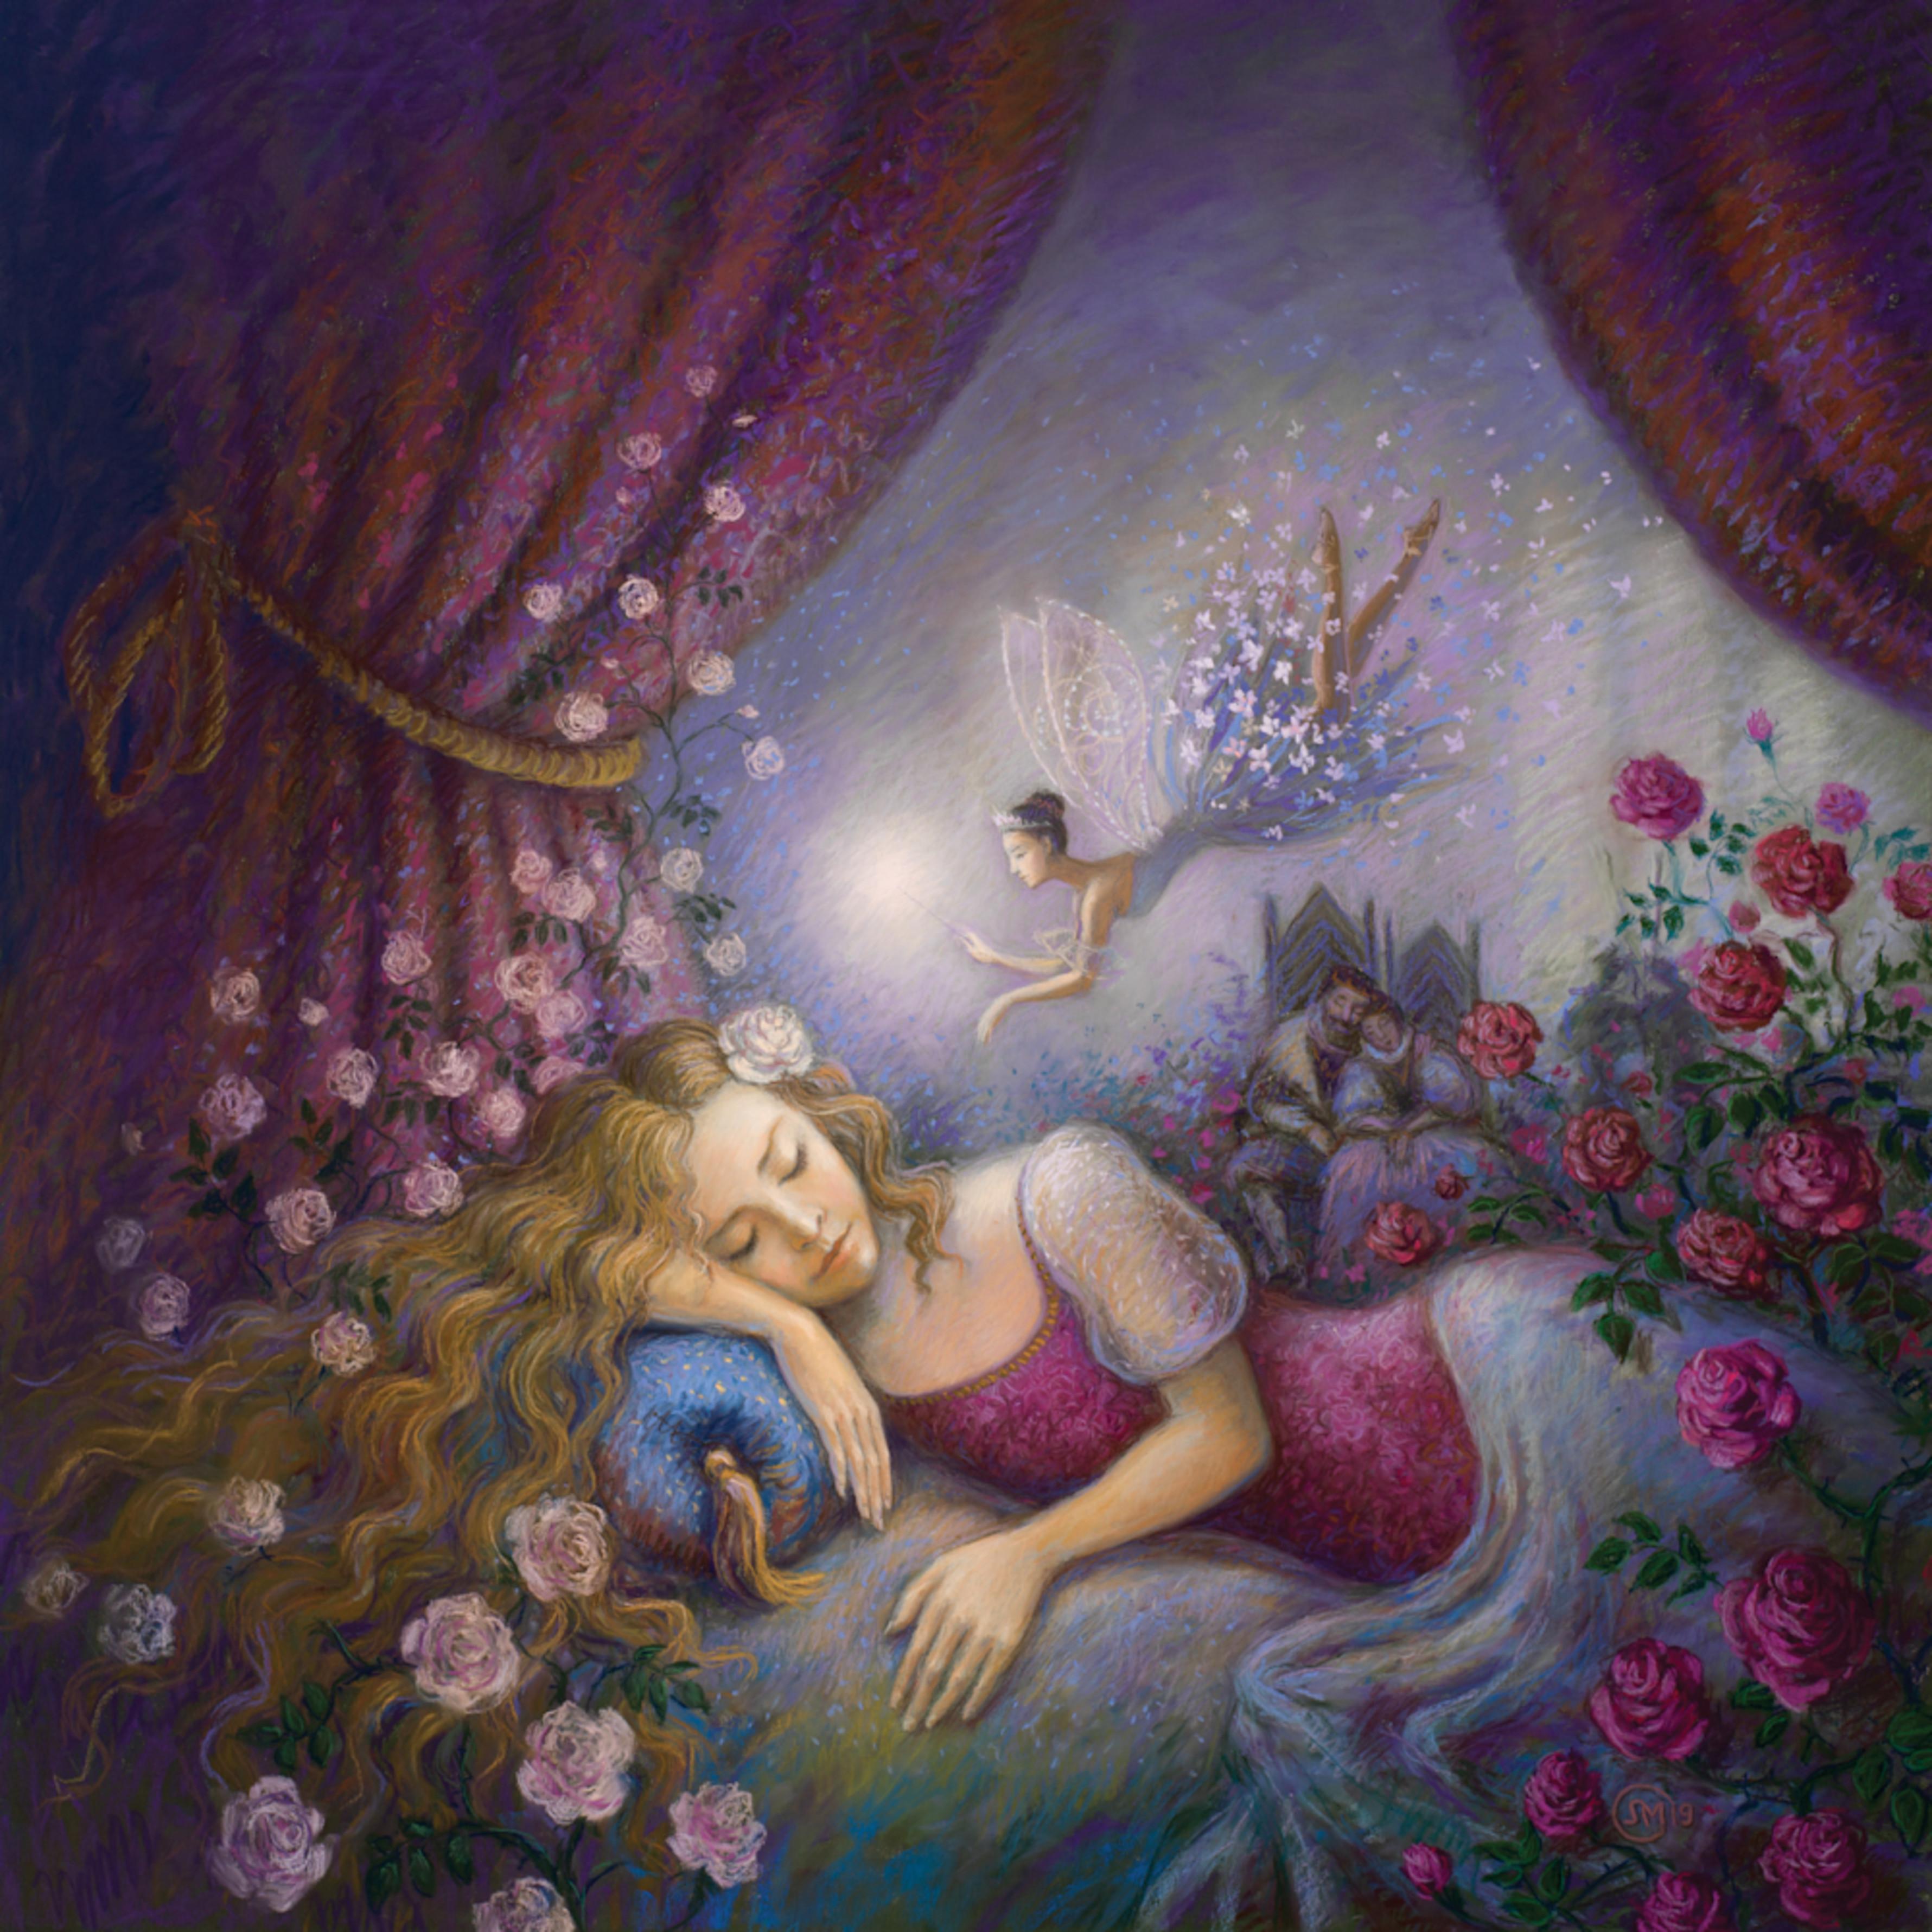 Sleeping beauty 2019 lyubabogan pastel an6xoa